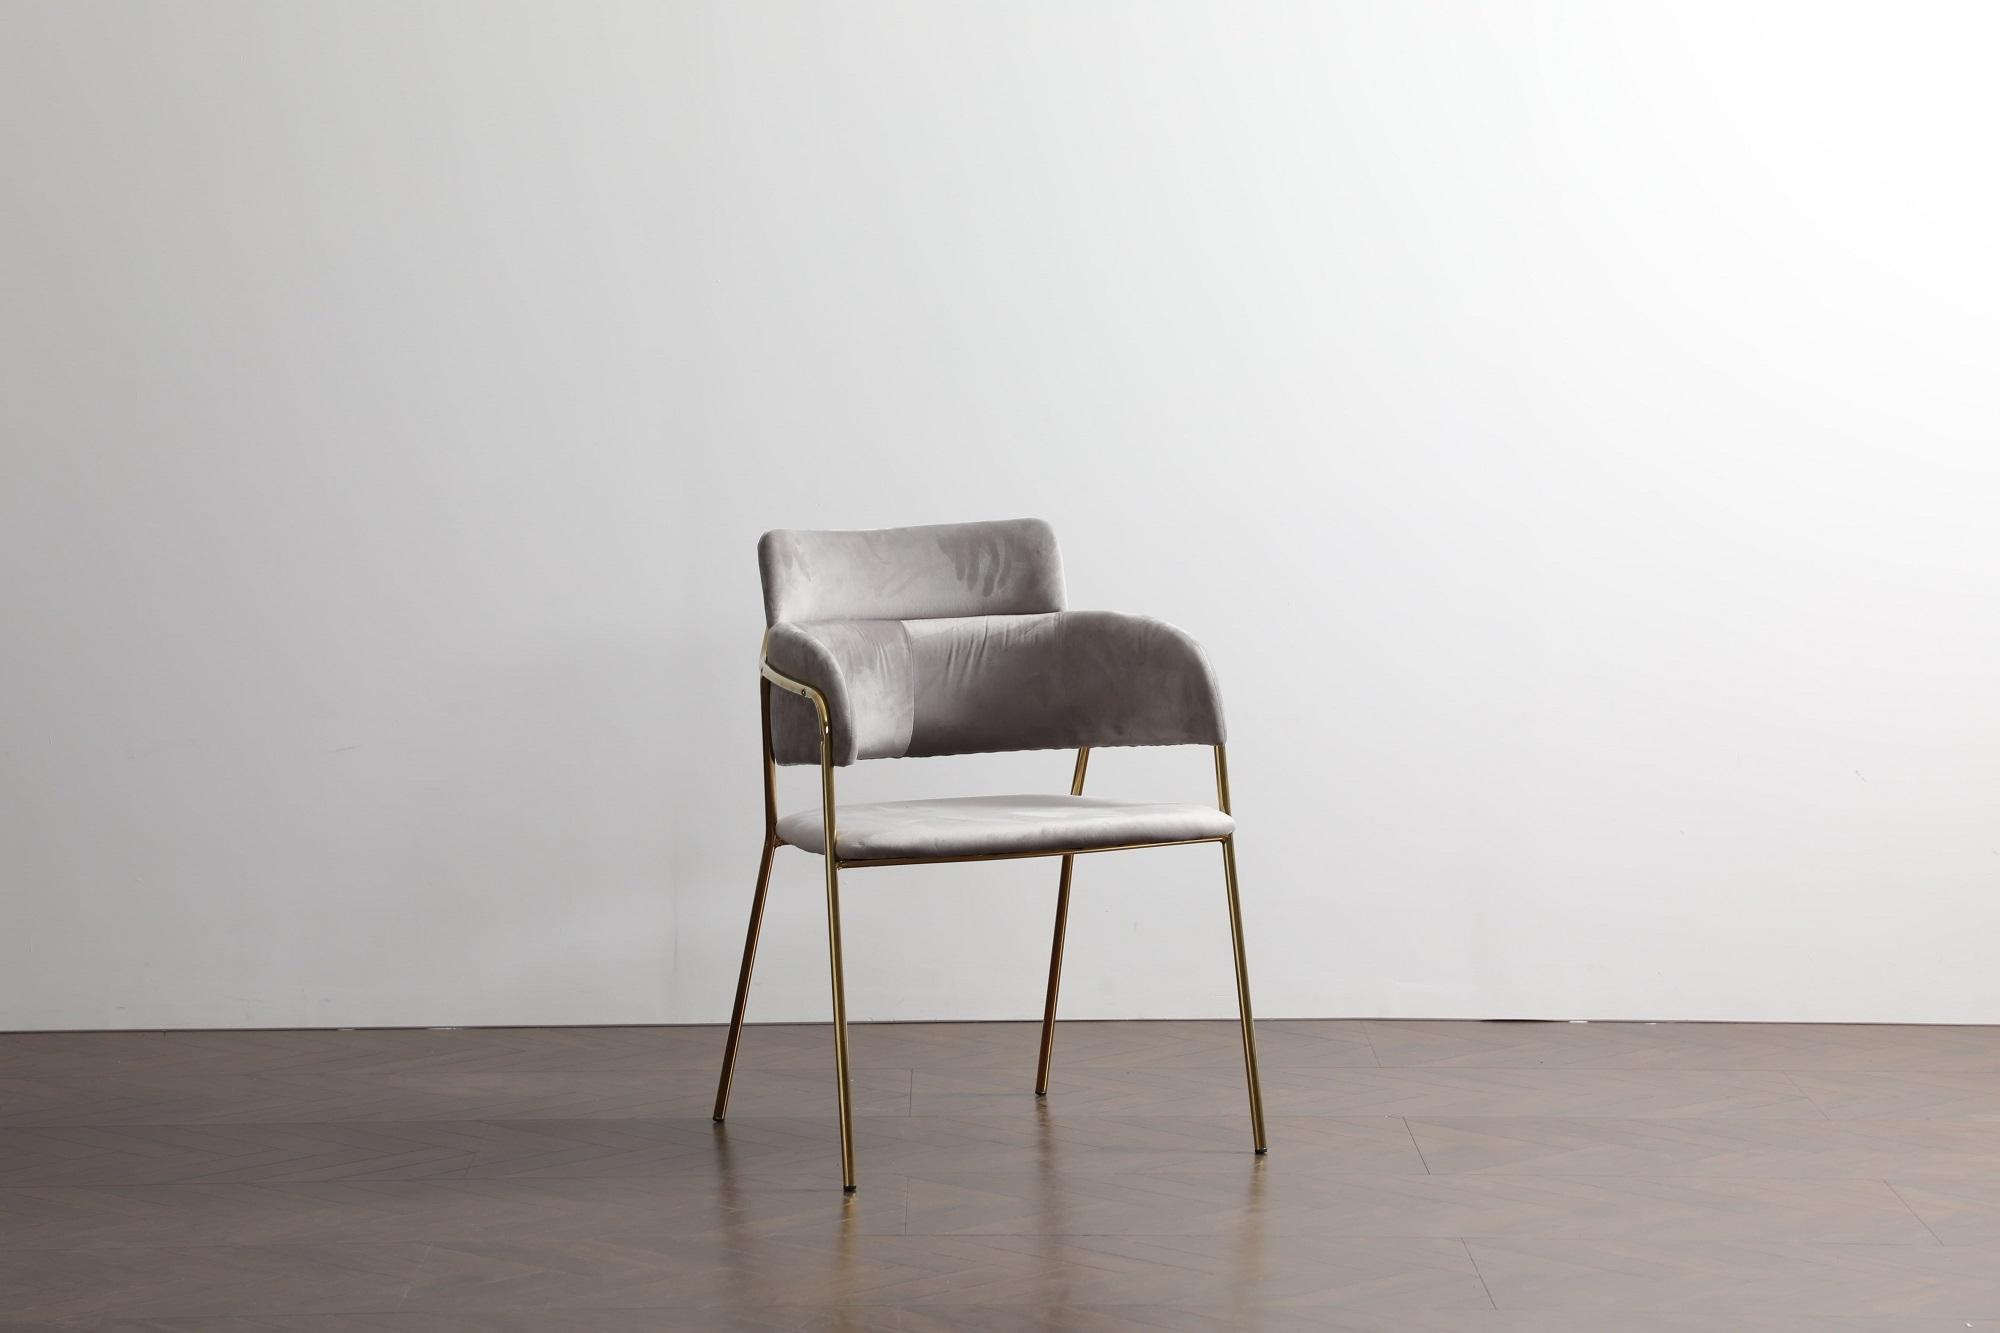 Scaun tapitat cu stofa, cu picioare metalice Eveline Velvet Grey, l48xA43xH84 cm